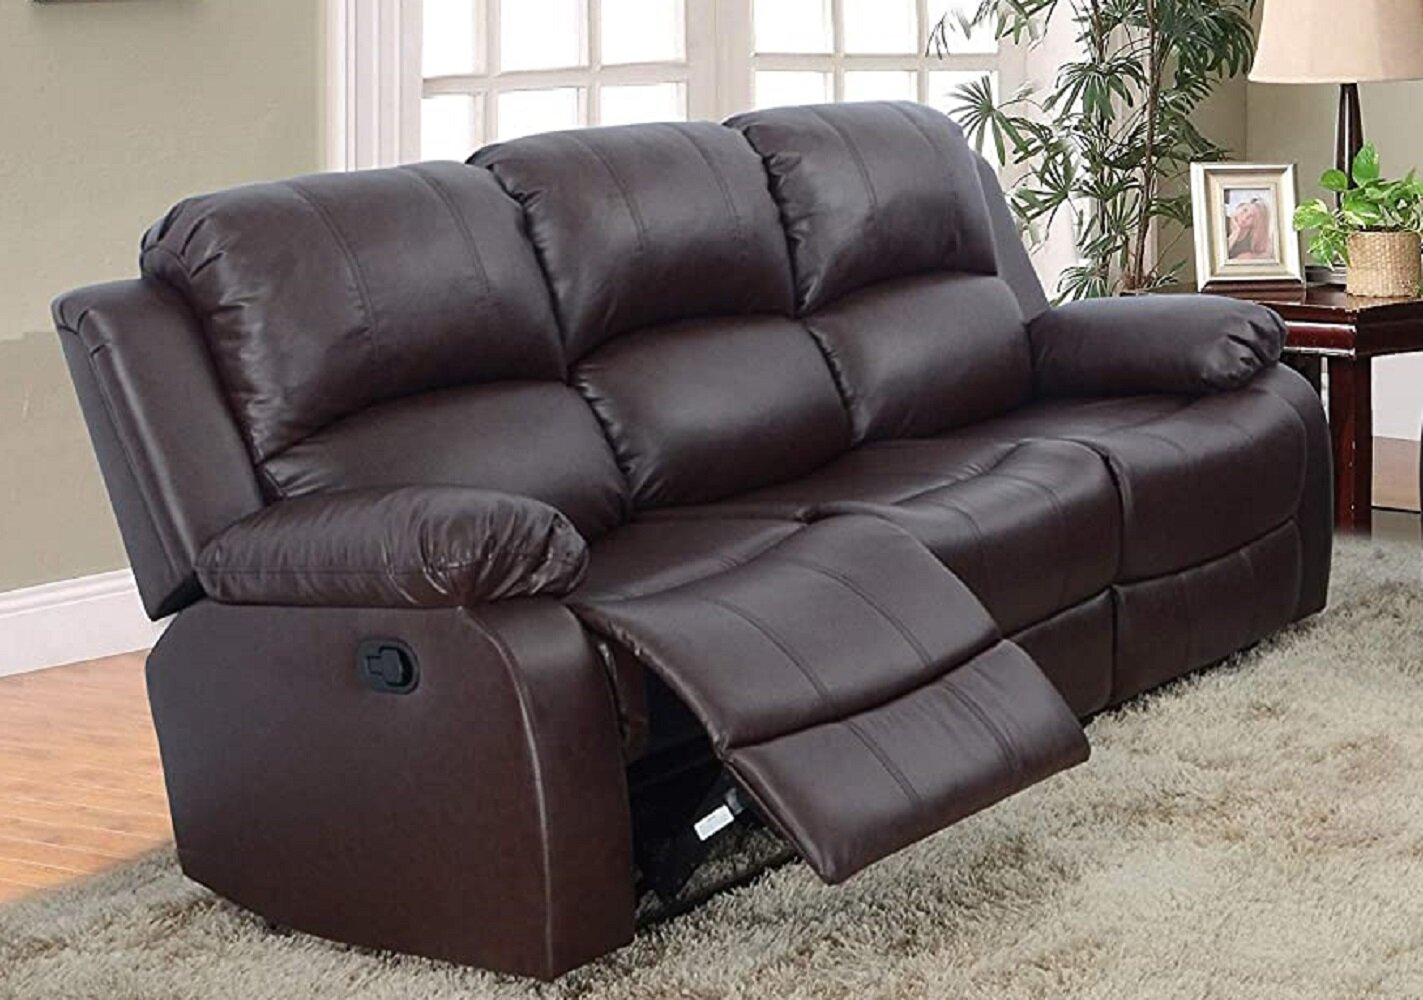 Pillow Top Arm Sofas You Ll Love In 2021 Wayfair